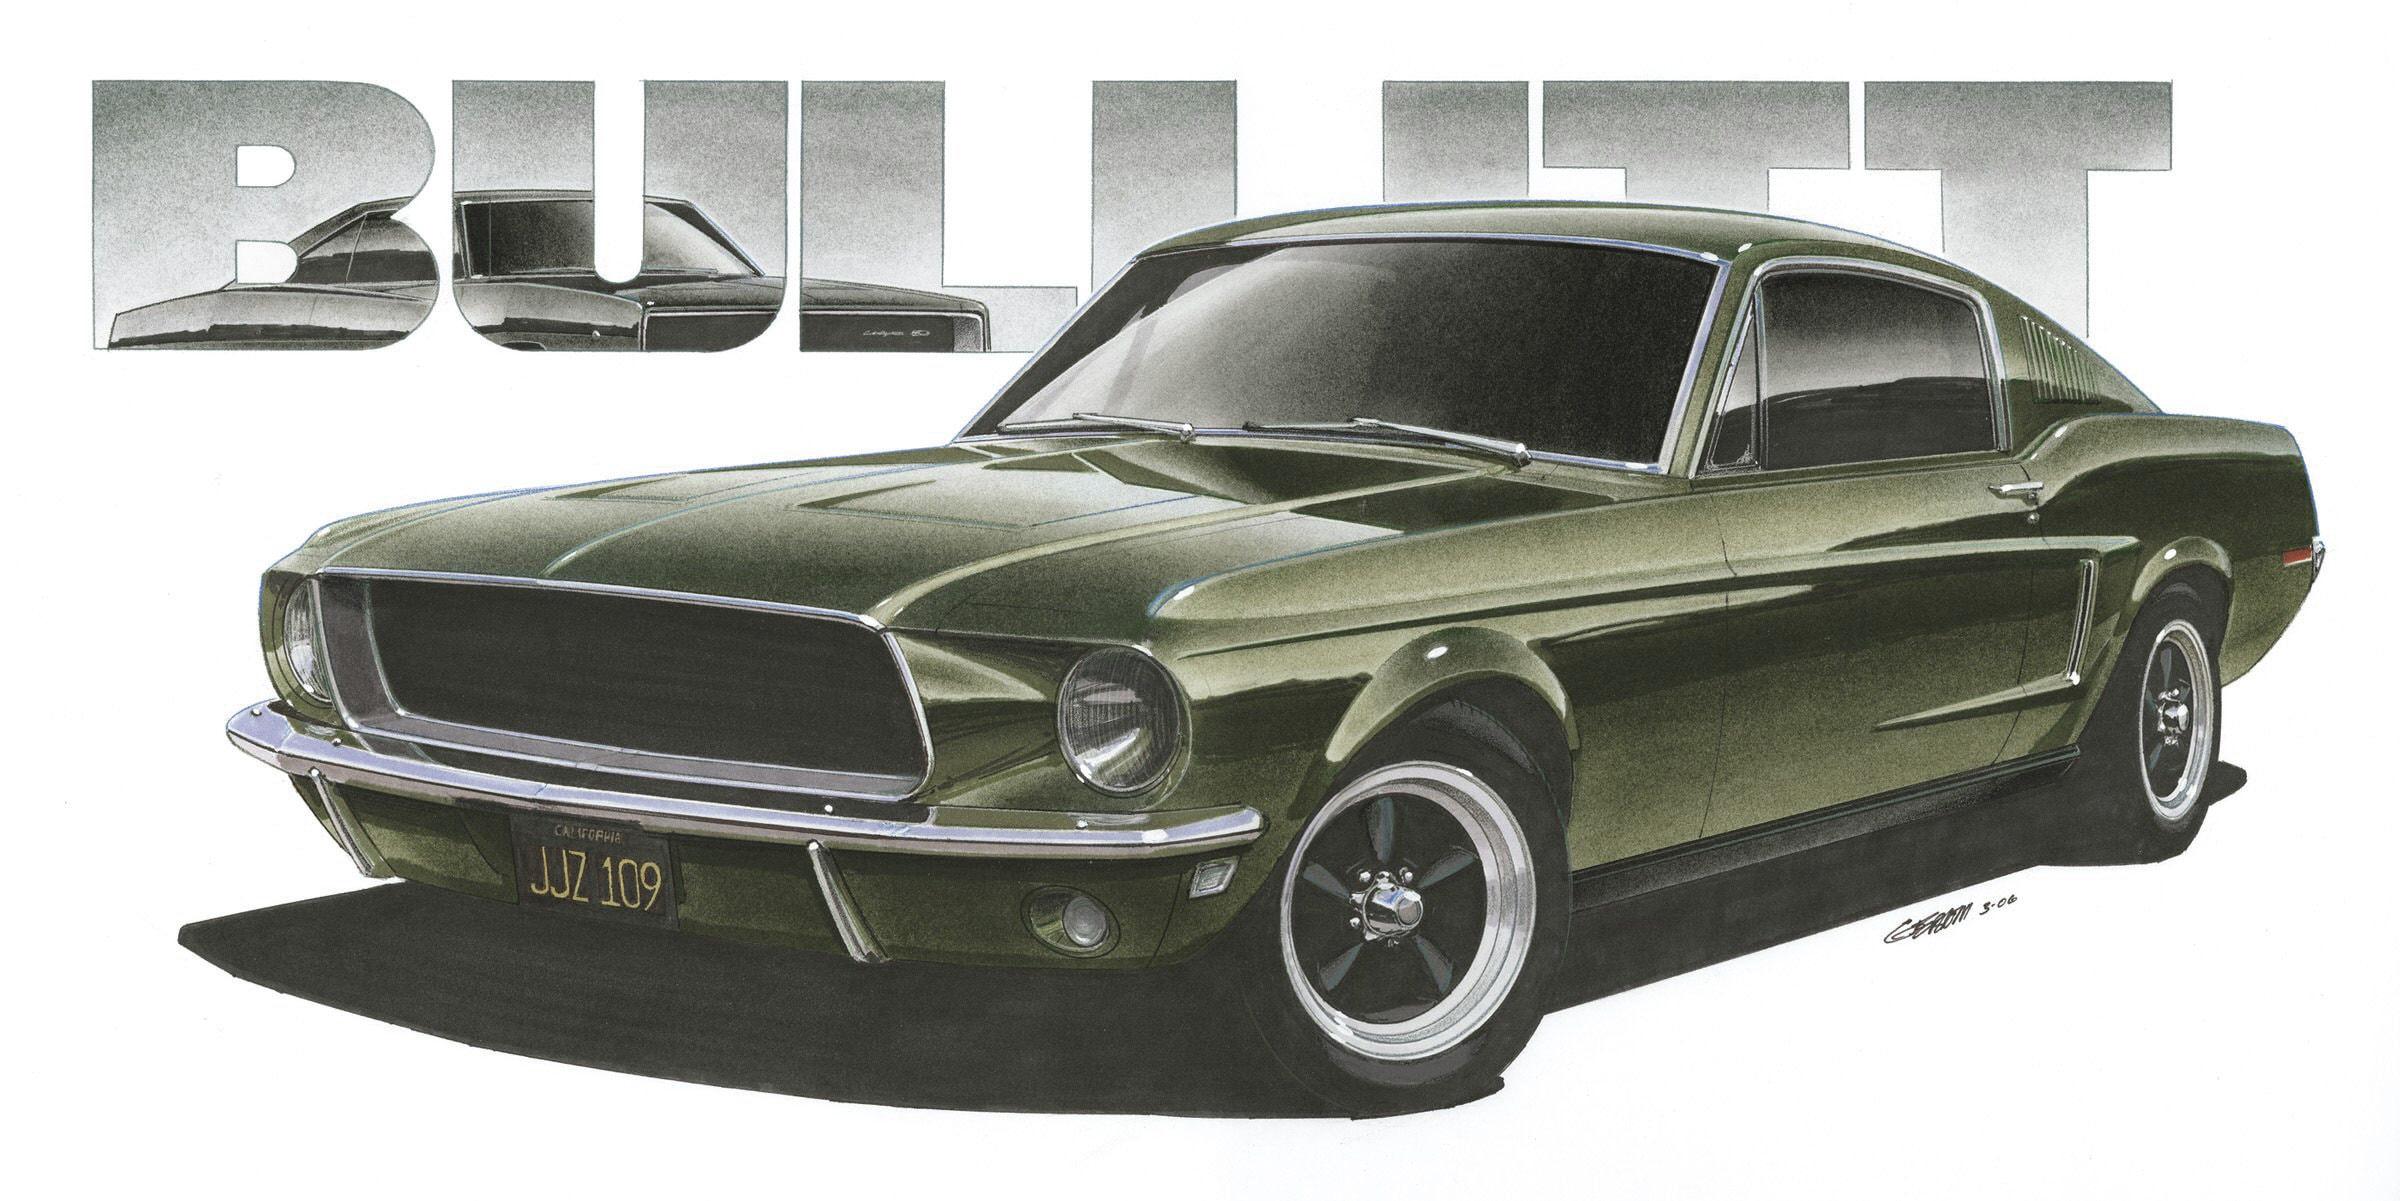 1968 ford mustang steve mcqueen bullitt 12x24 inch art print by jim gerdom